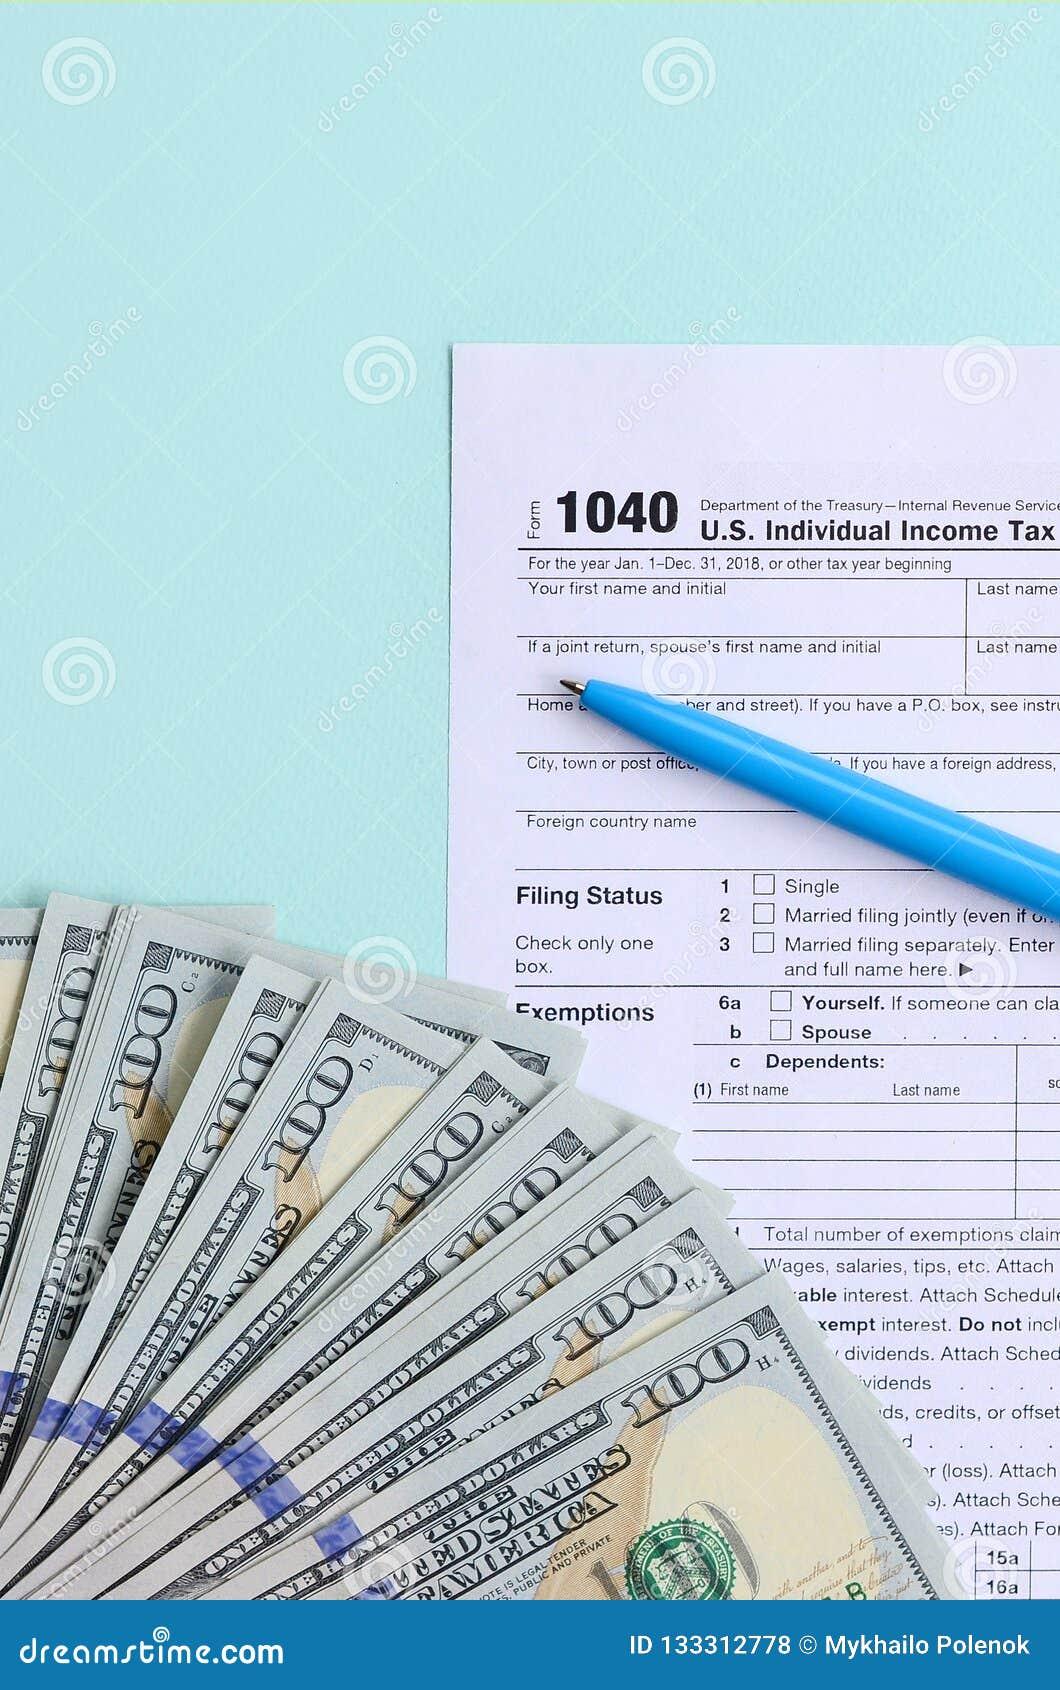 1040 Tax Form Lies Near Hundred Dollar Bills And Blue Pen On